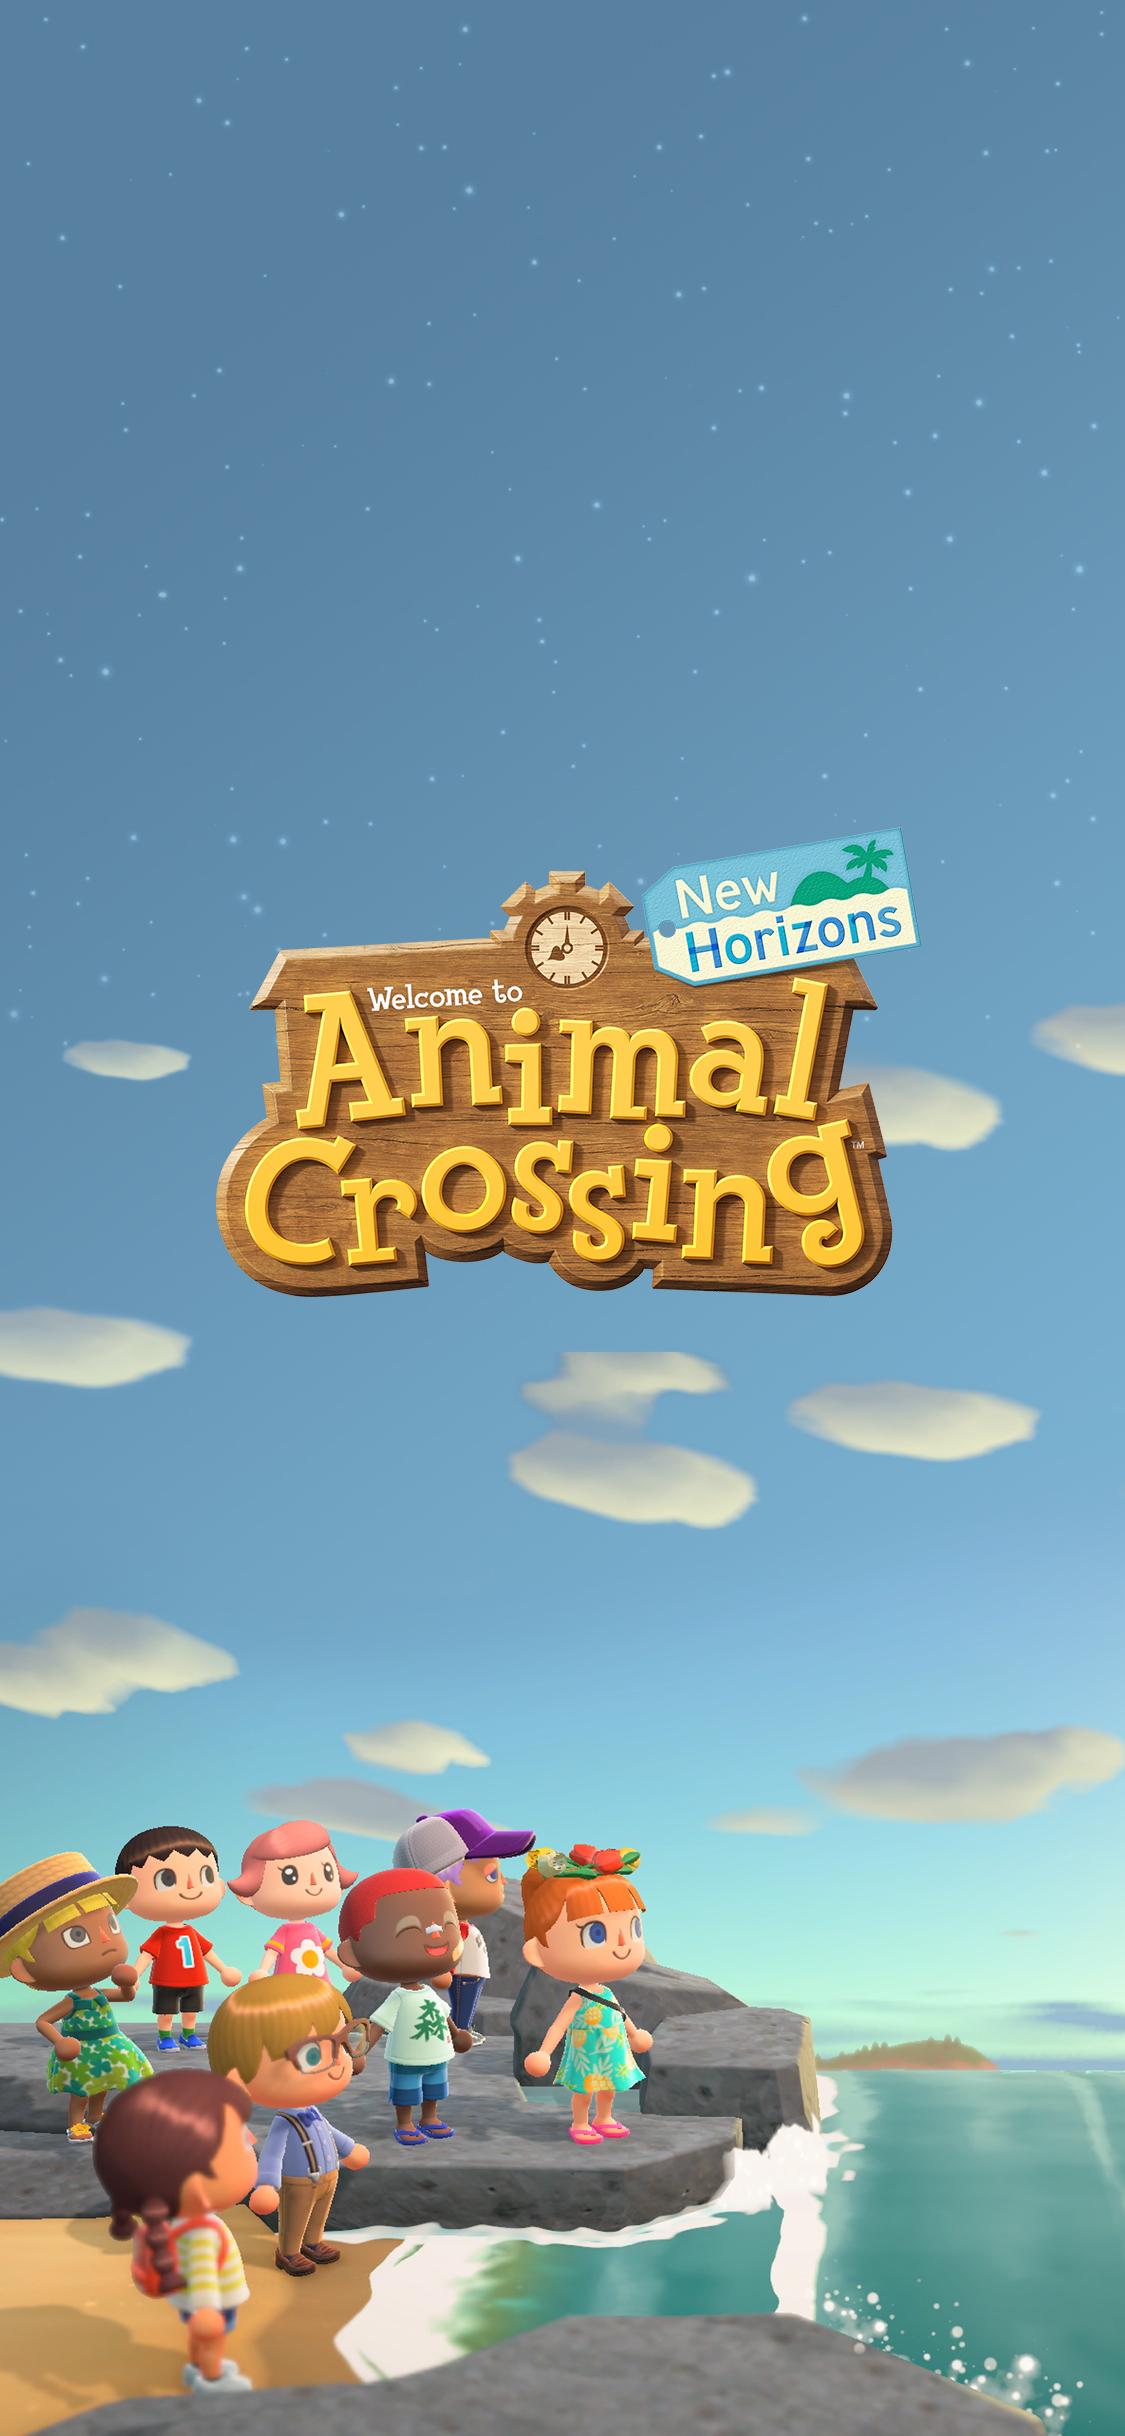 Animal Crossing New Horizons Shoreline Wallpaper Cat